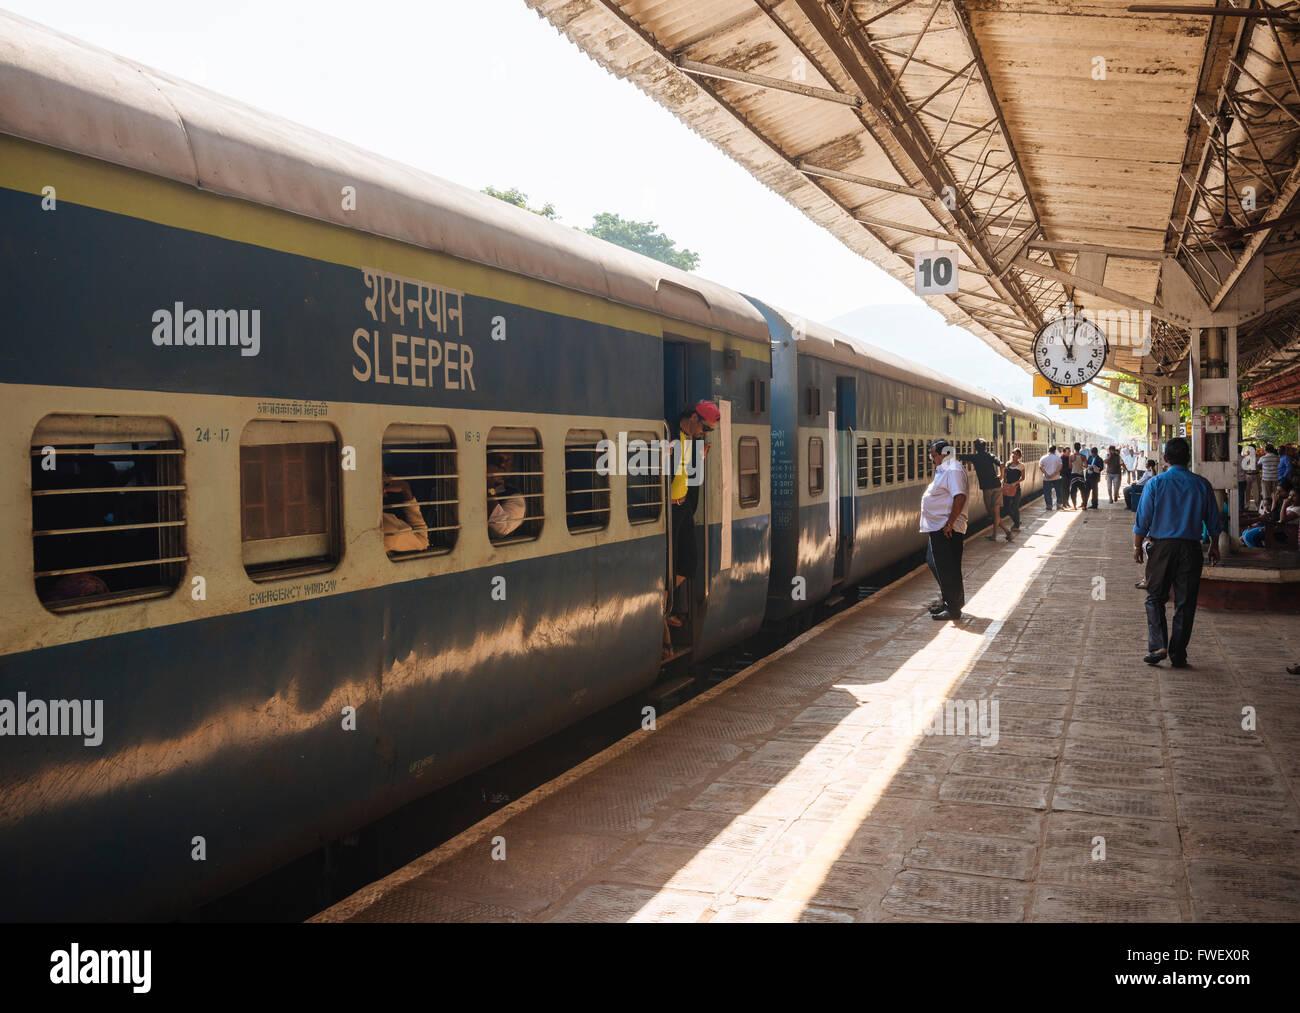 Karwal train station platform, Goa, India, South Asia - Stock Image